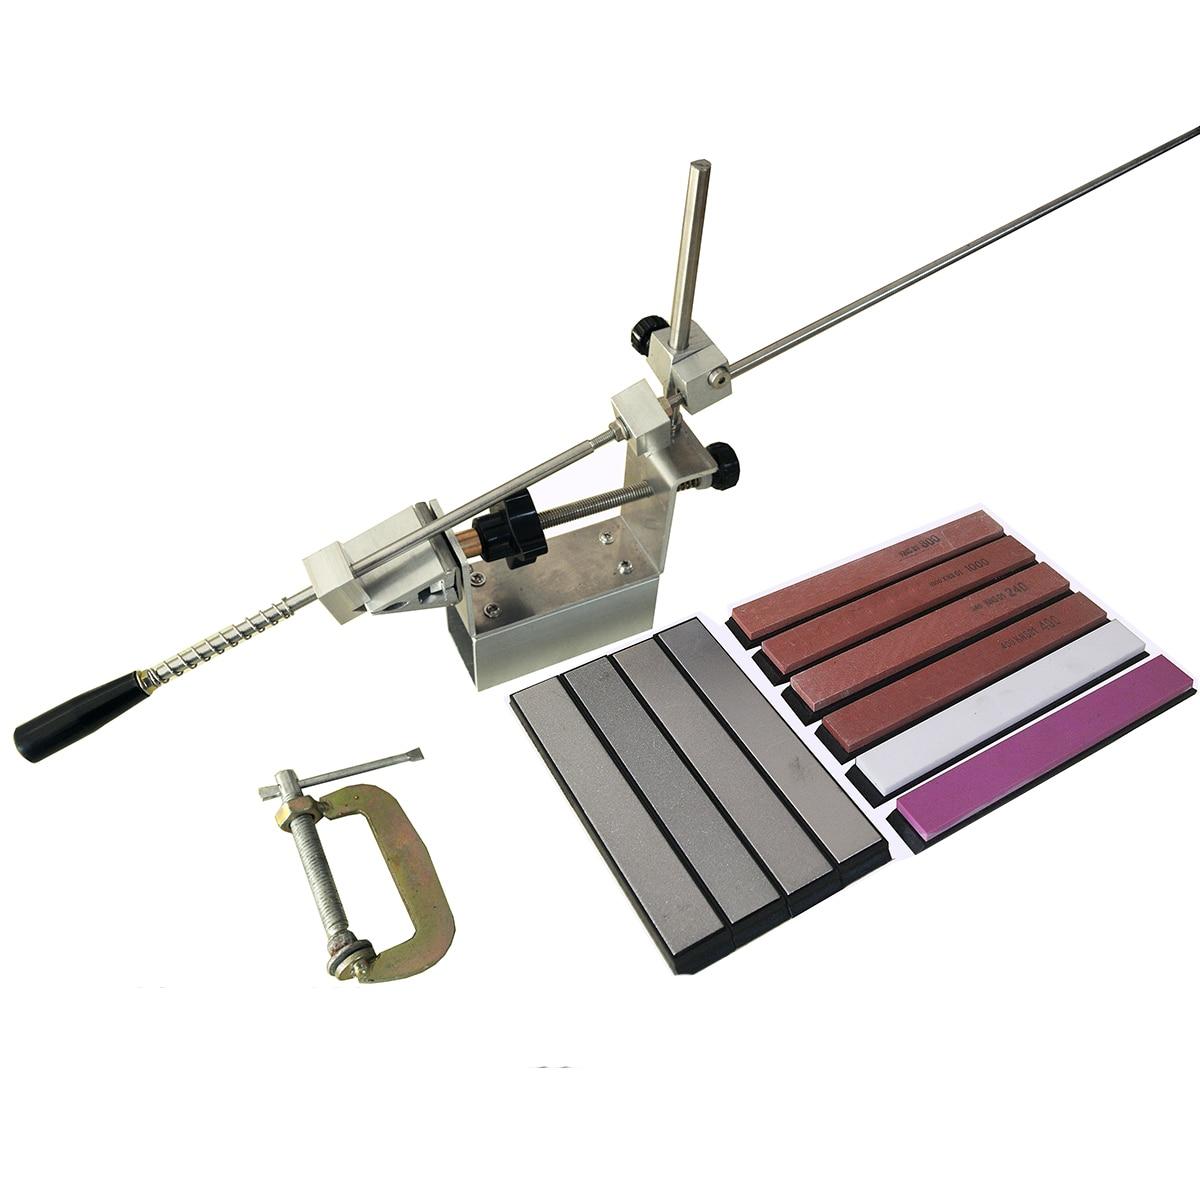 Pro Aluminum Alloy Steel Professional Knife Sharpener Tool Sharpening Machine Kitchen Accessories Grinding Device Bar Diamond